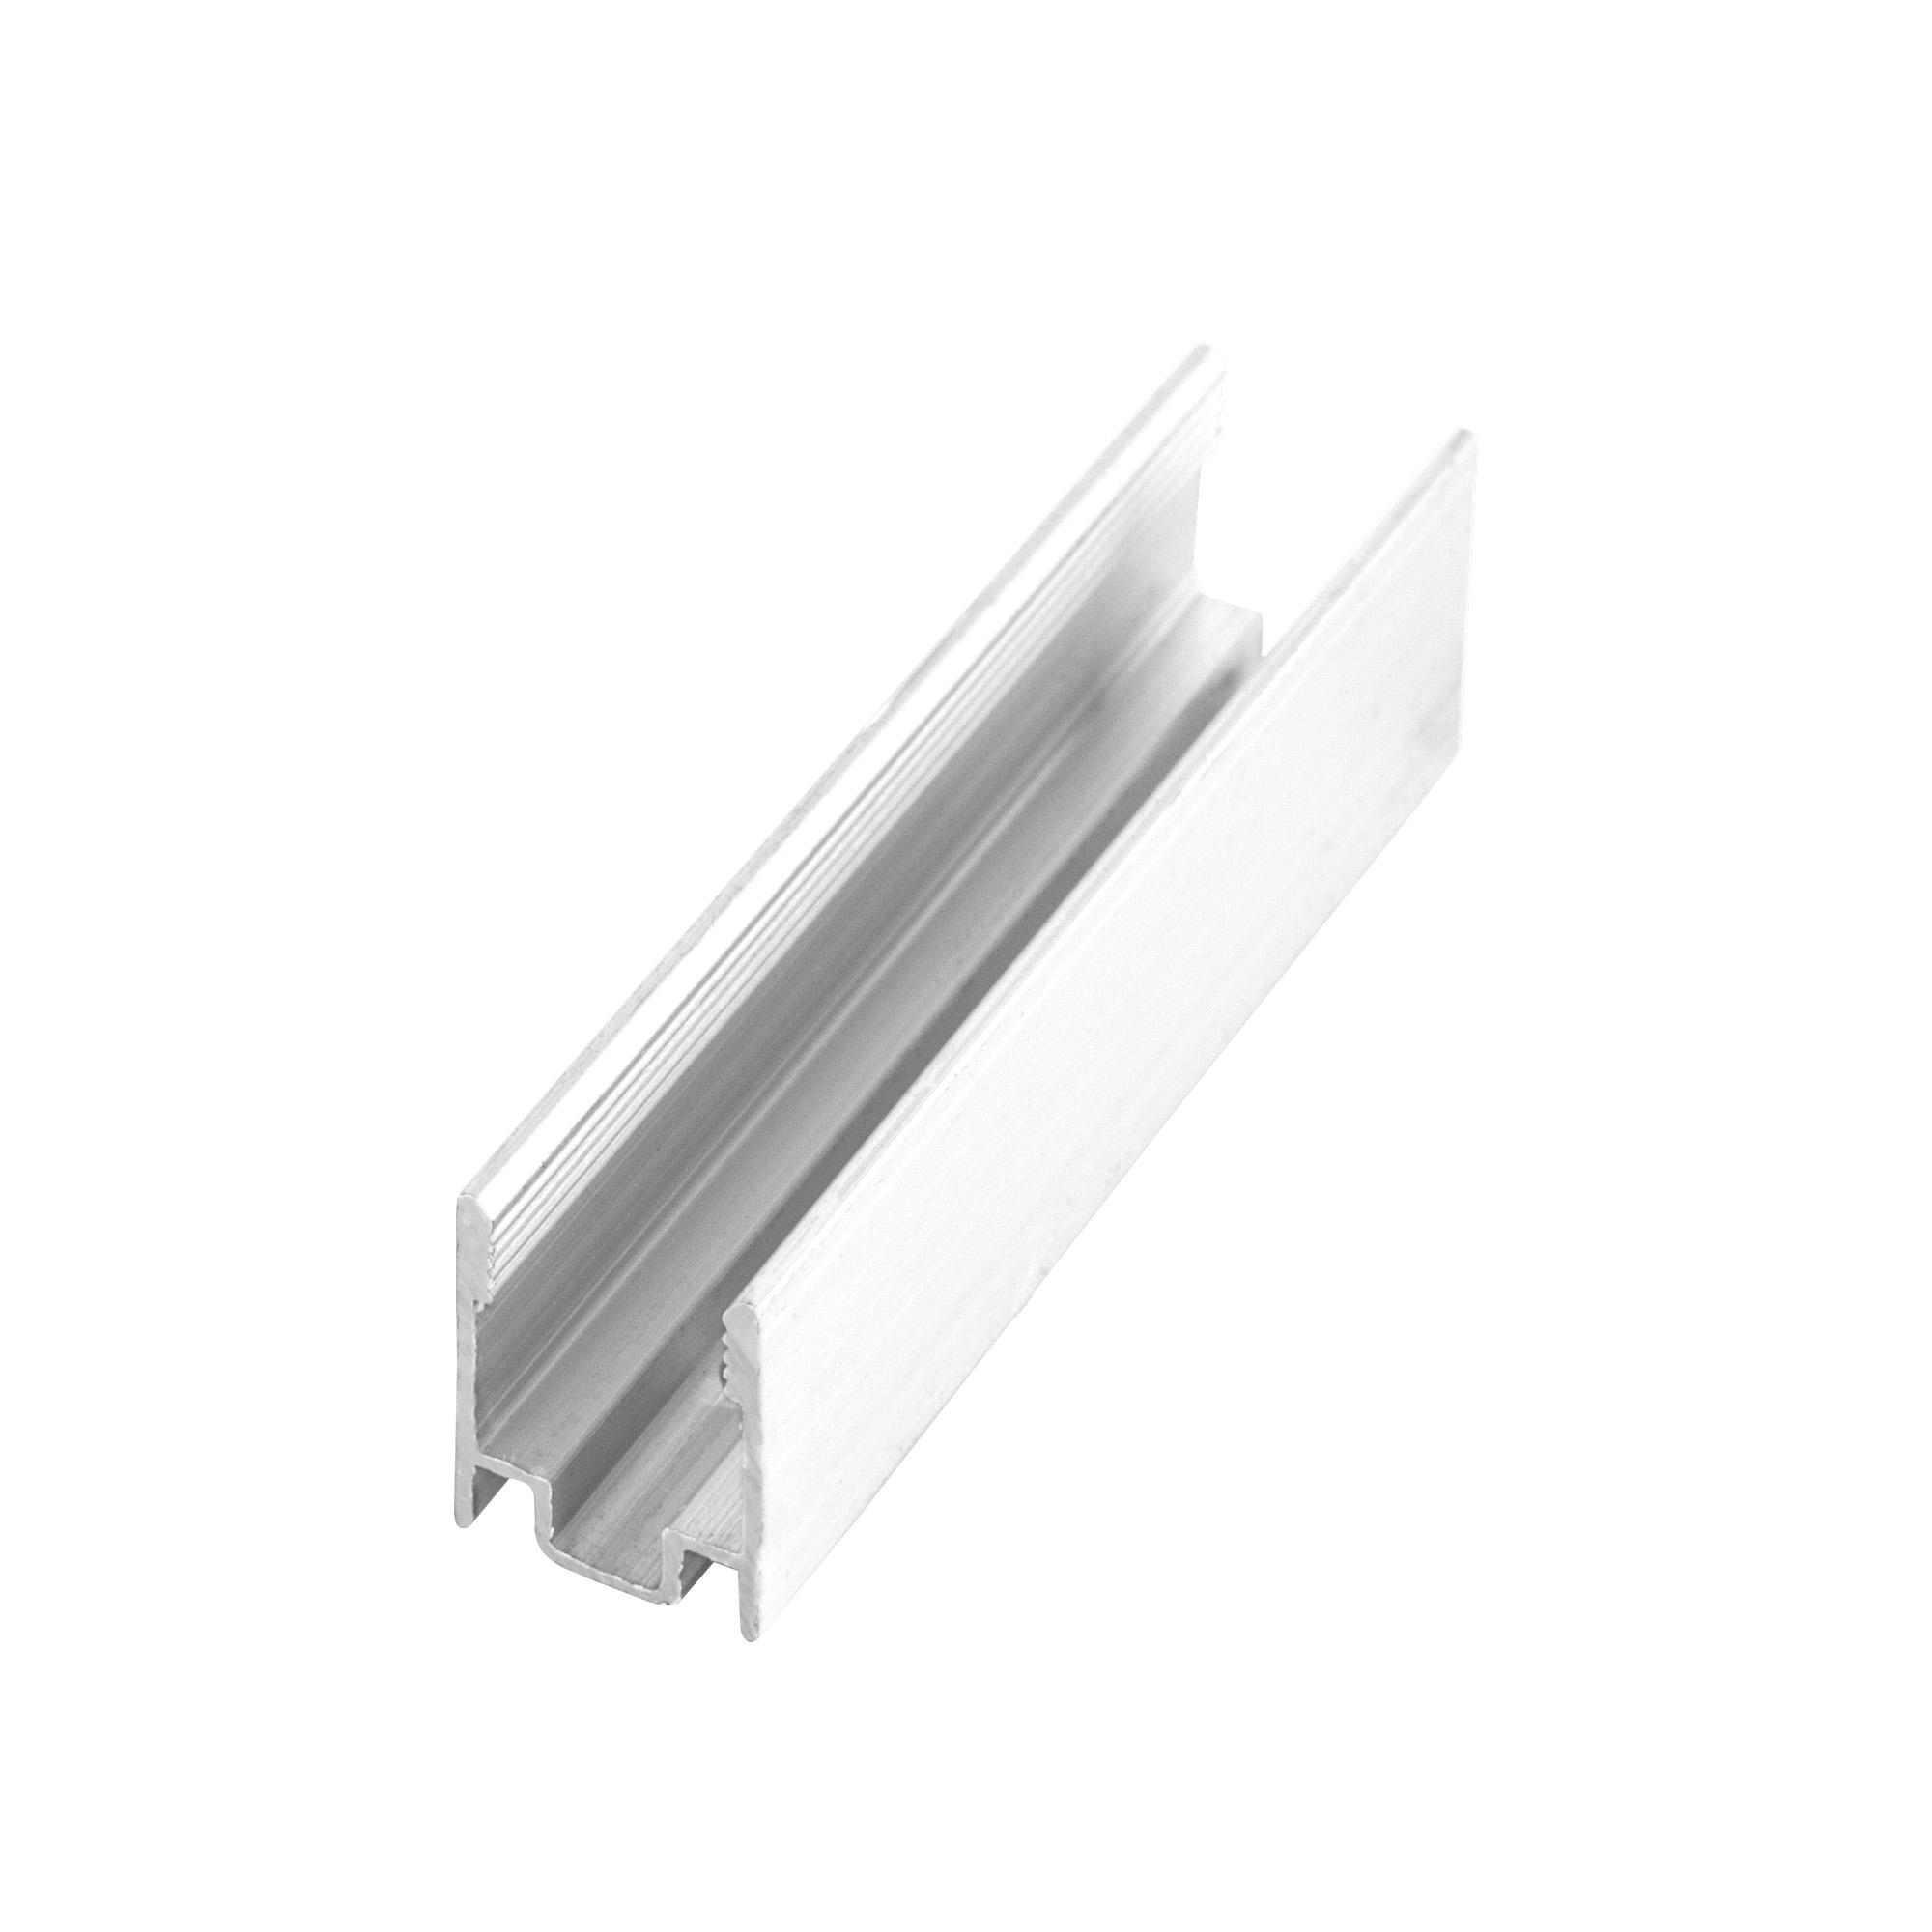 Крепеж для неона 220V 2835 одностороннего (10pkt) (Clip 220V 2835 single)